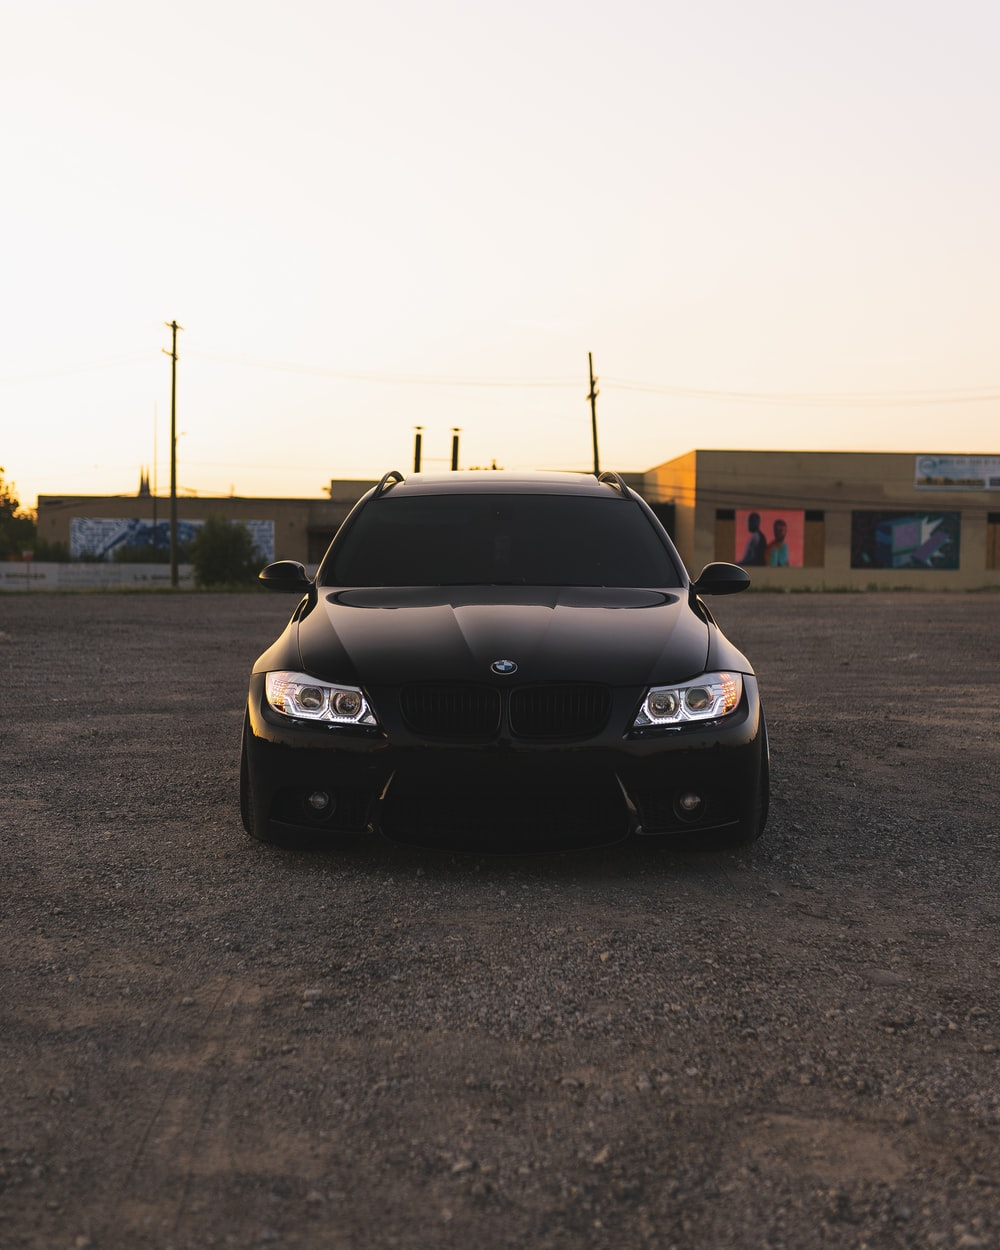 black bmw m 3 parked on parking lot during daytime